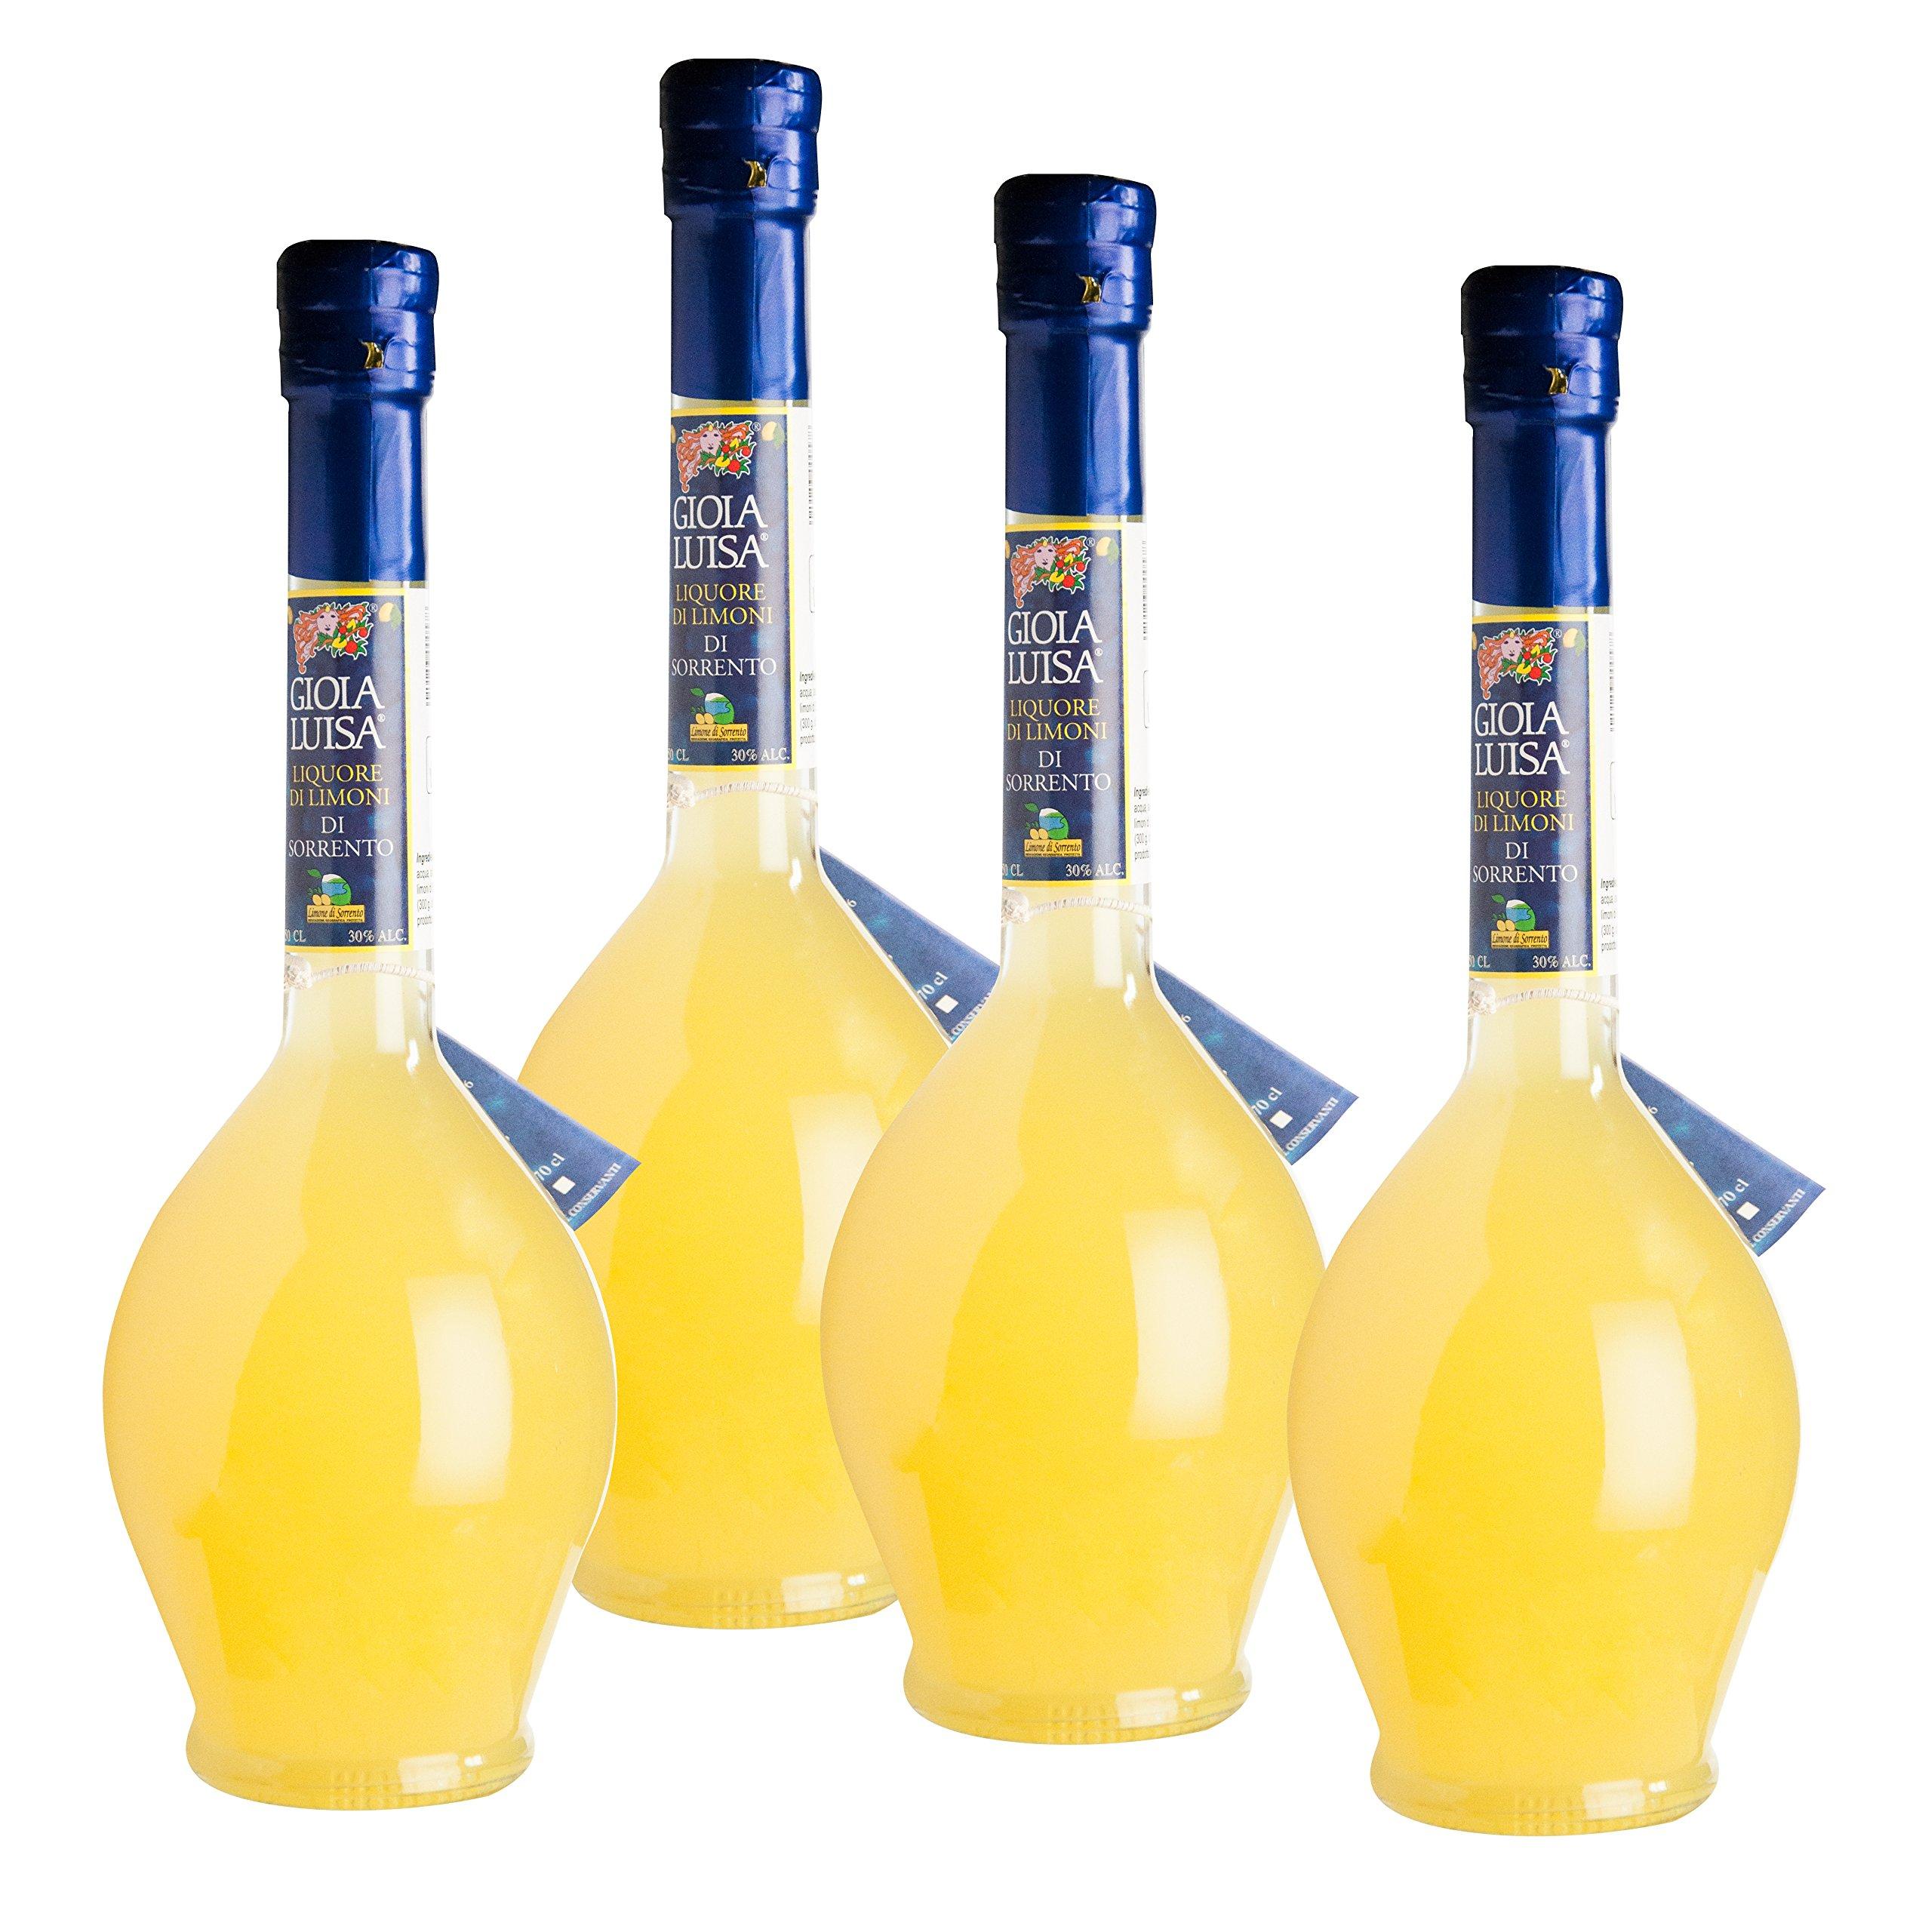 Limoncello of Sorrento Gioia Luisa (Pack 4 Bottles) by Gioia Luisa